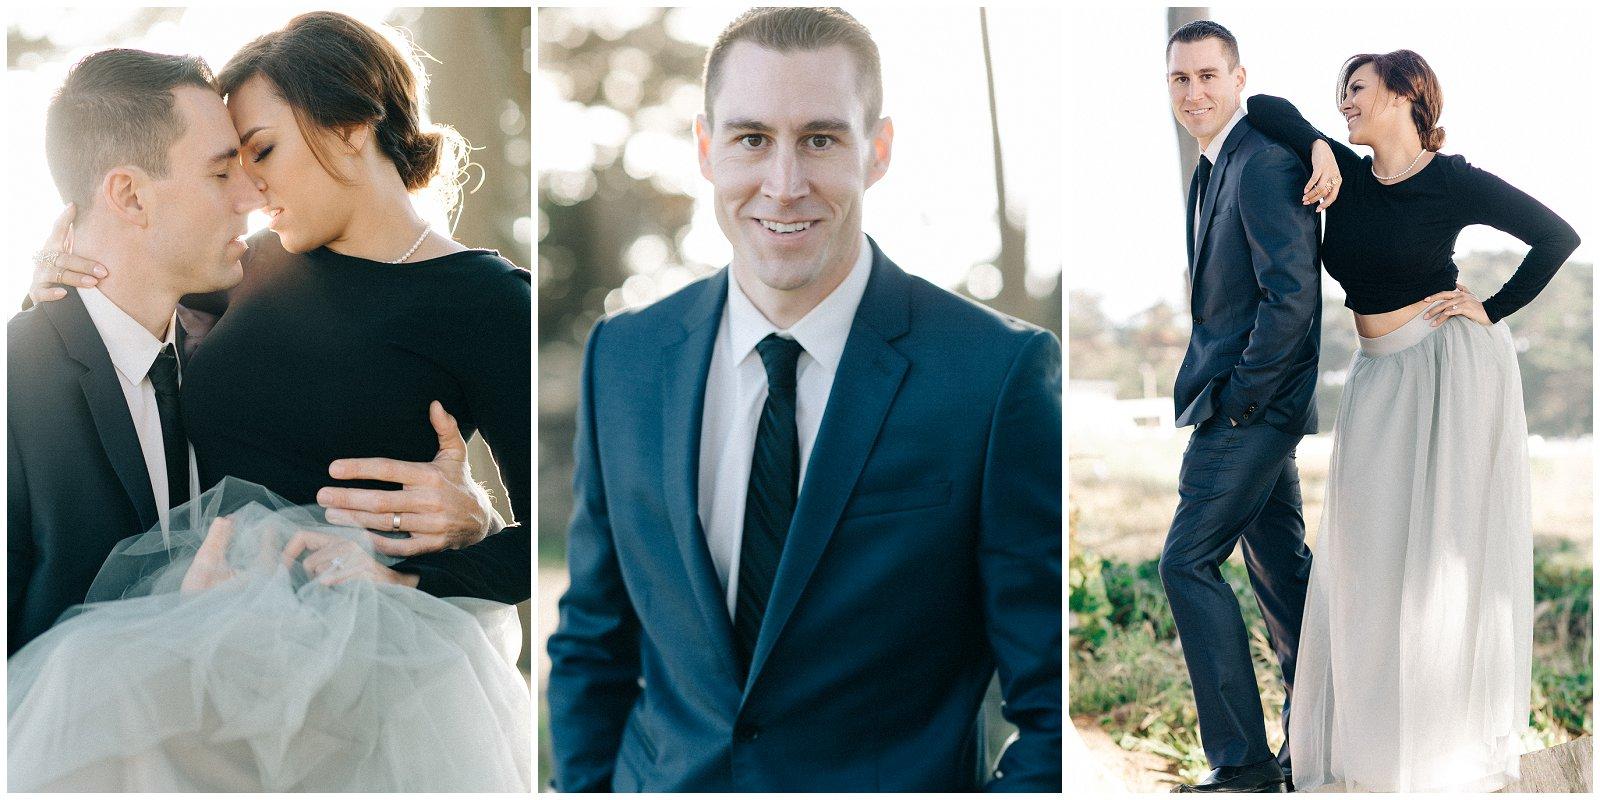 San-Francisco-Bay-Area-Wedding-Photography-Engagment-Session-3.jpg